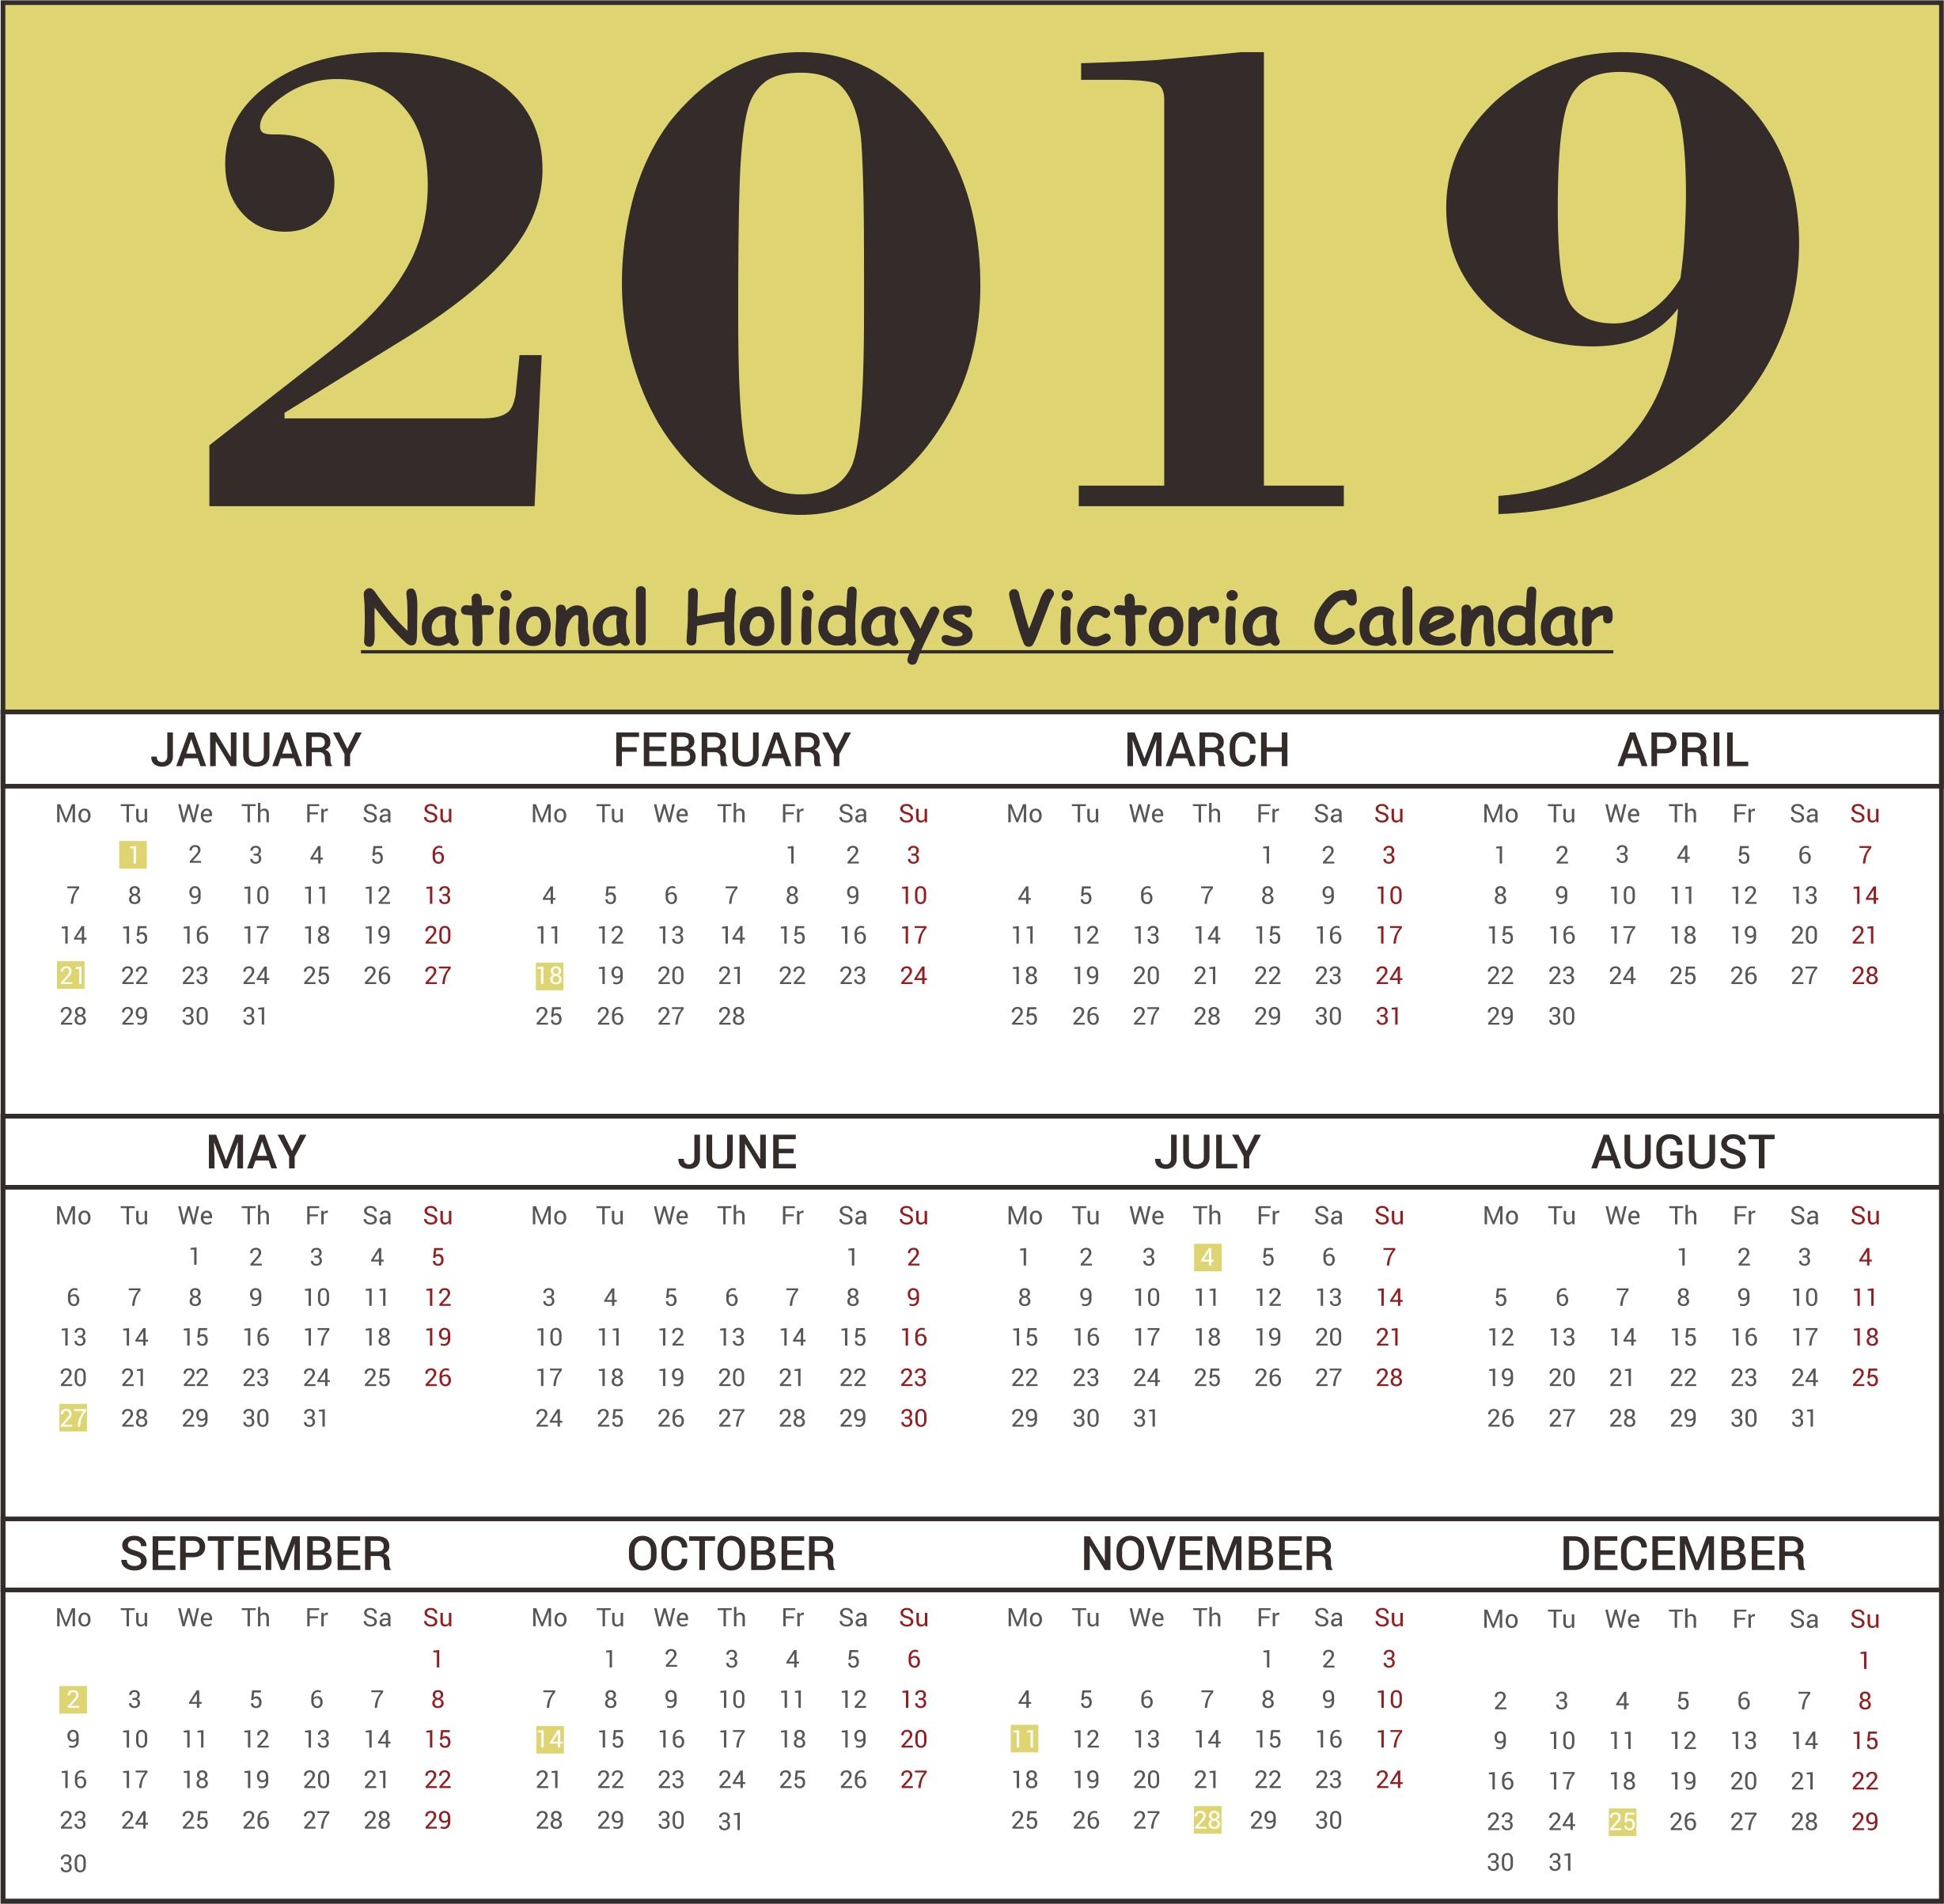 Calendar School Holidays Victoria • Printable Blank Calendar Template Calendar 2019 Vic School Holidays